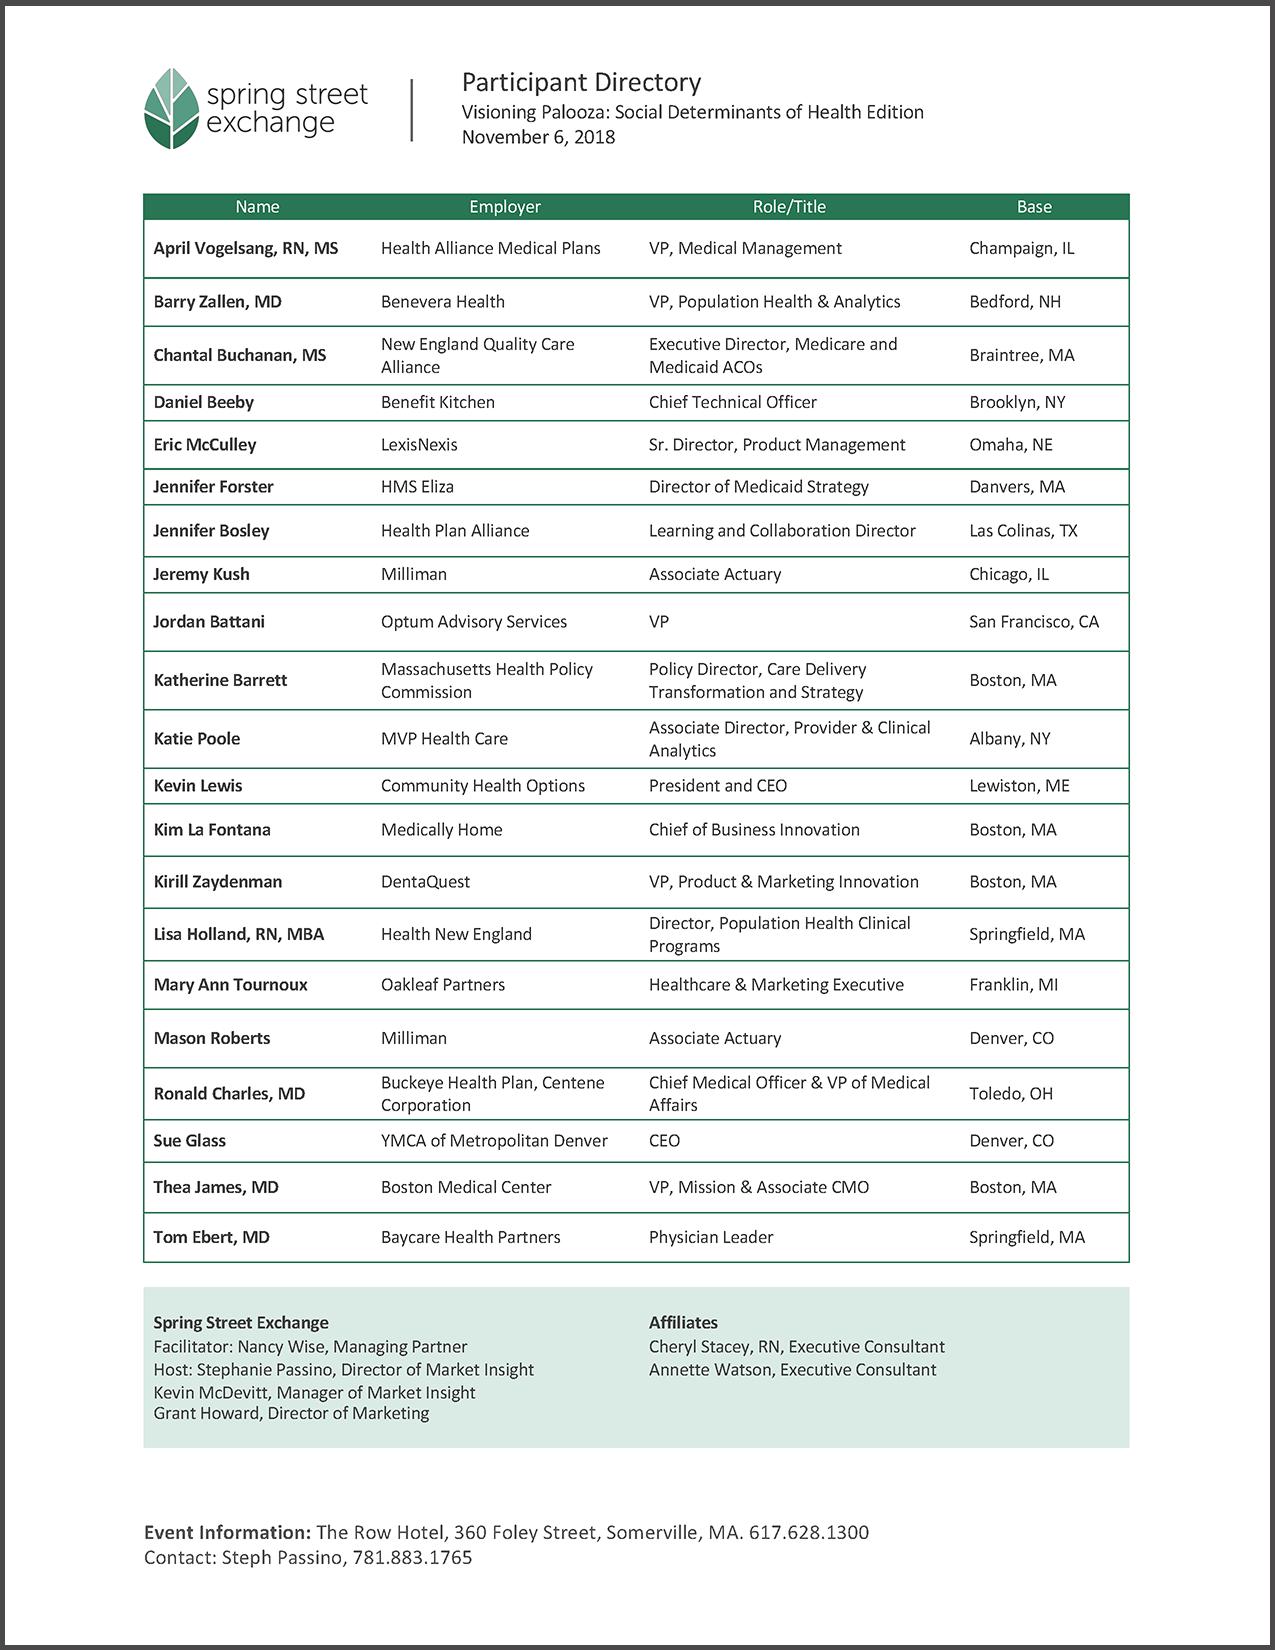 Participant Directory